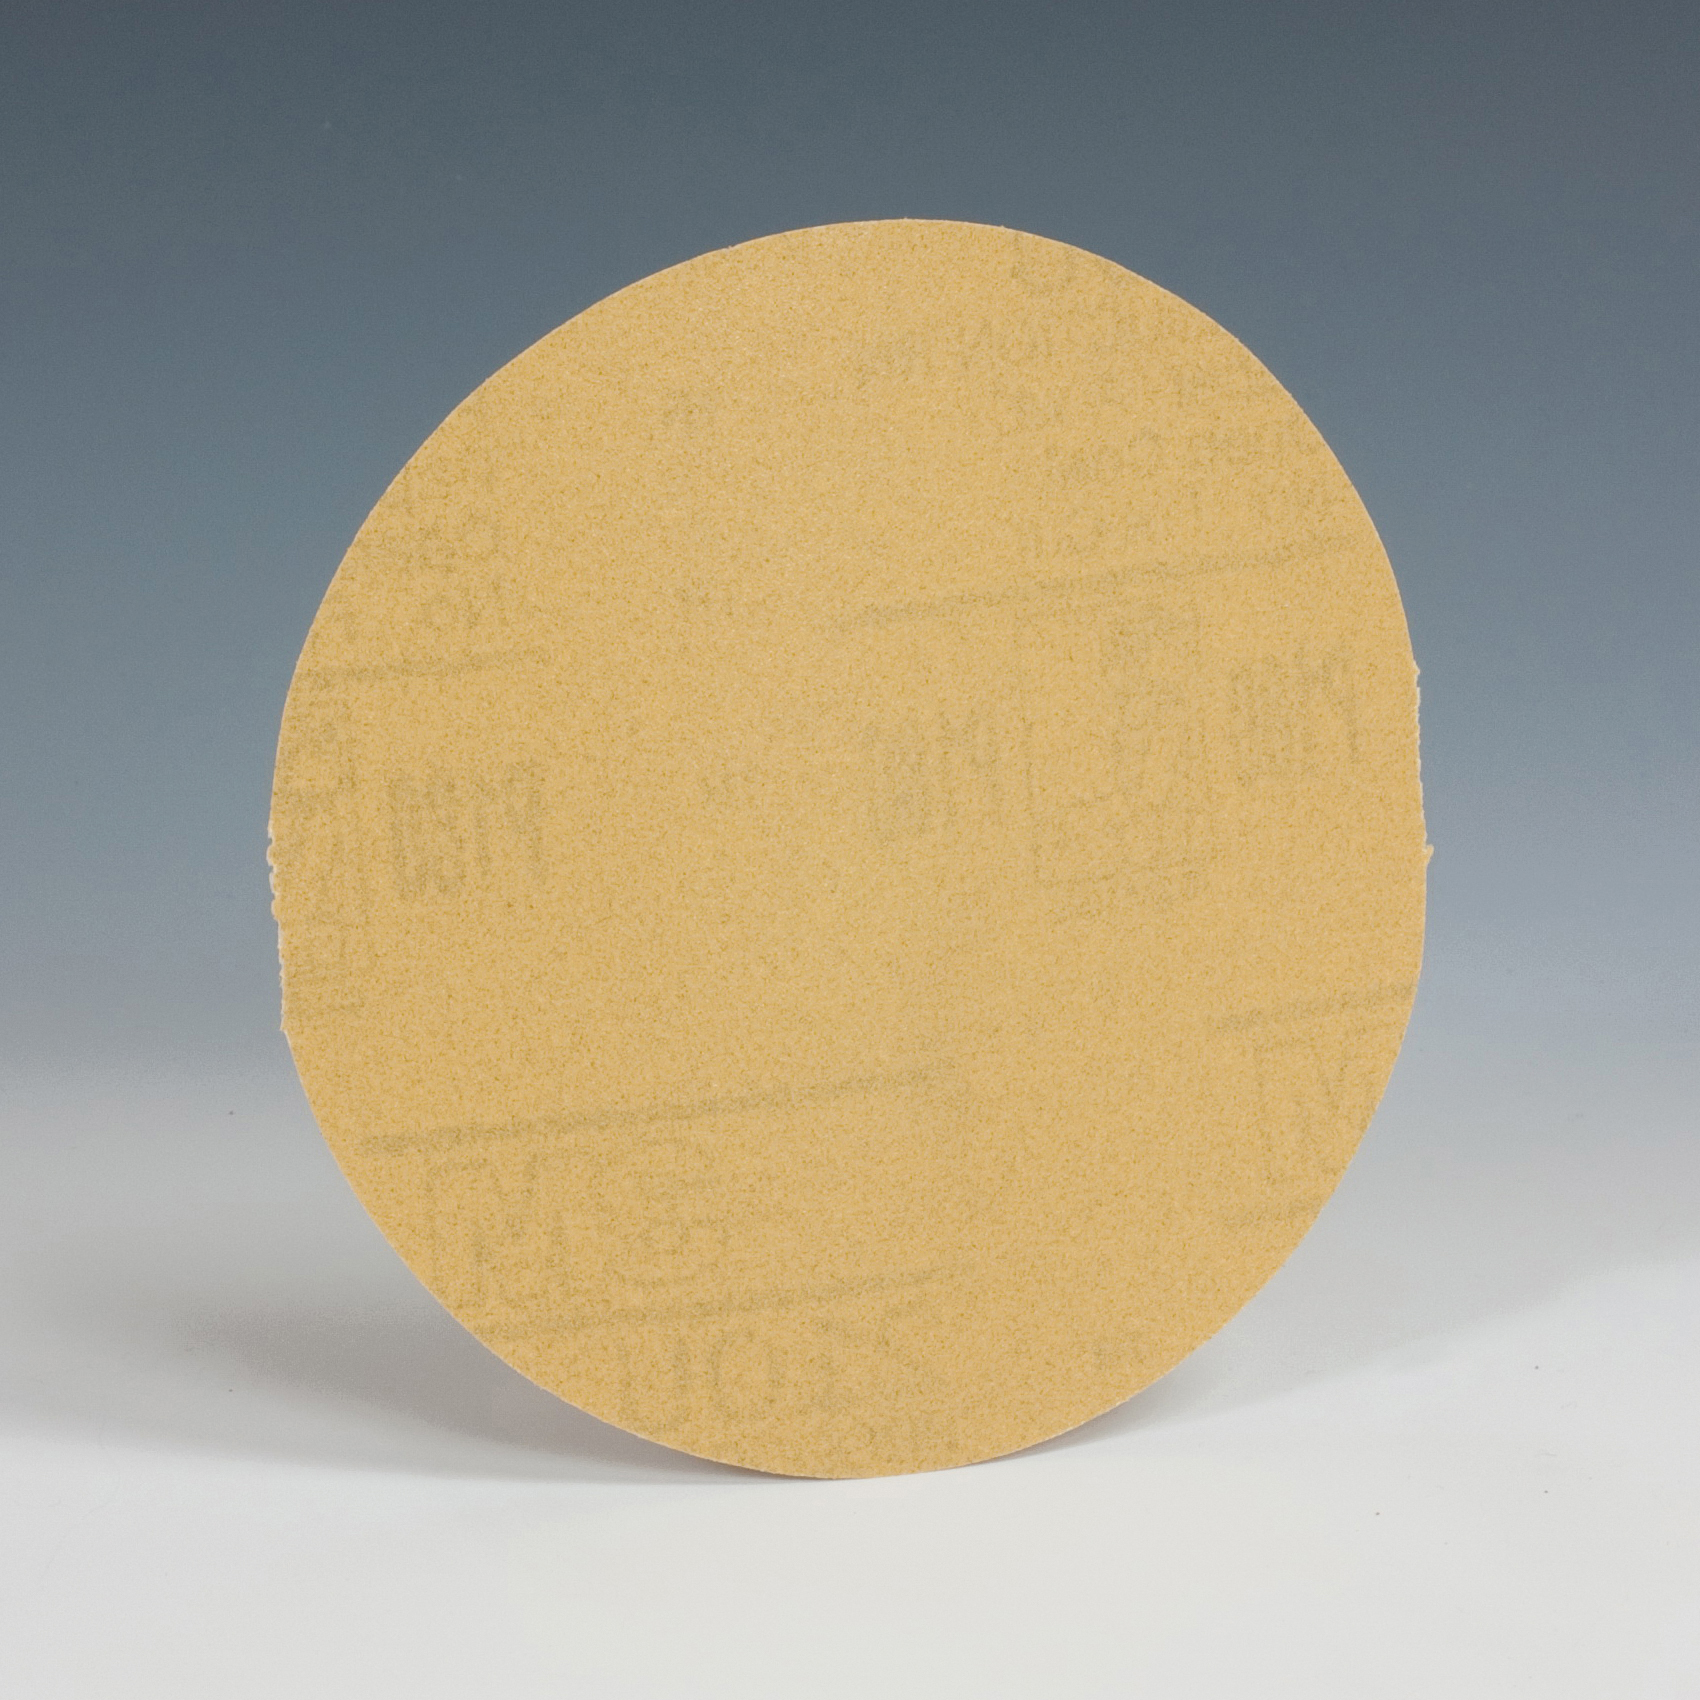 3M™ Hookit™ 051144-85115 210U Open Coated Abrasive Abrasive Disc, 5 in Dia Disc, P240 Grit, Very Fine Grade, Aluminum Oxide Abrasive, Paper Backing